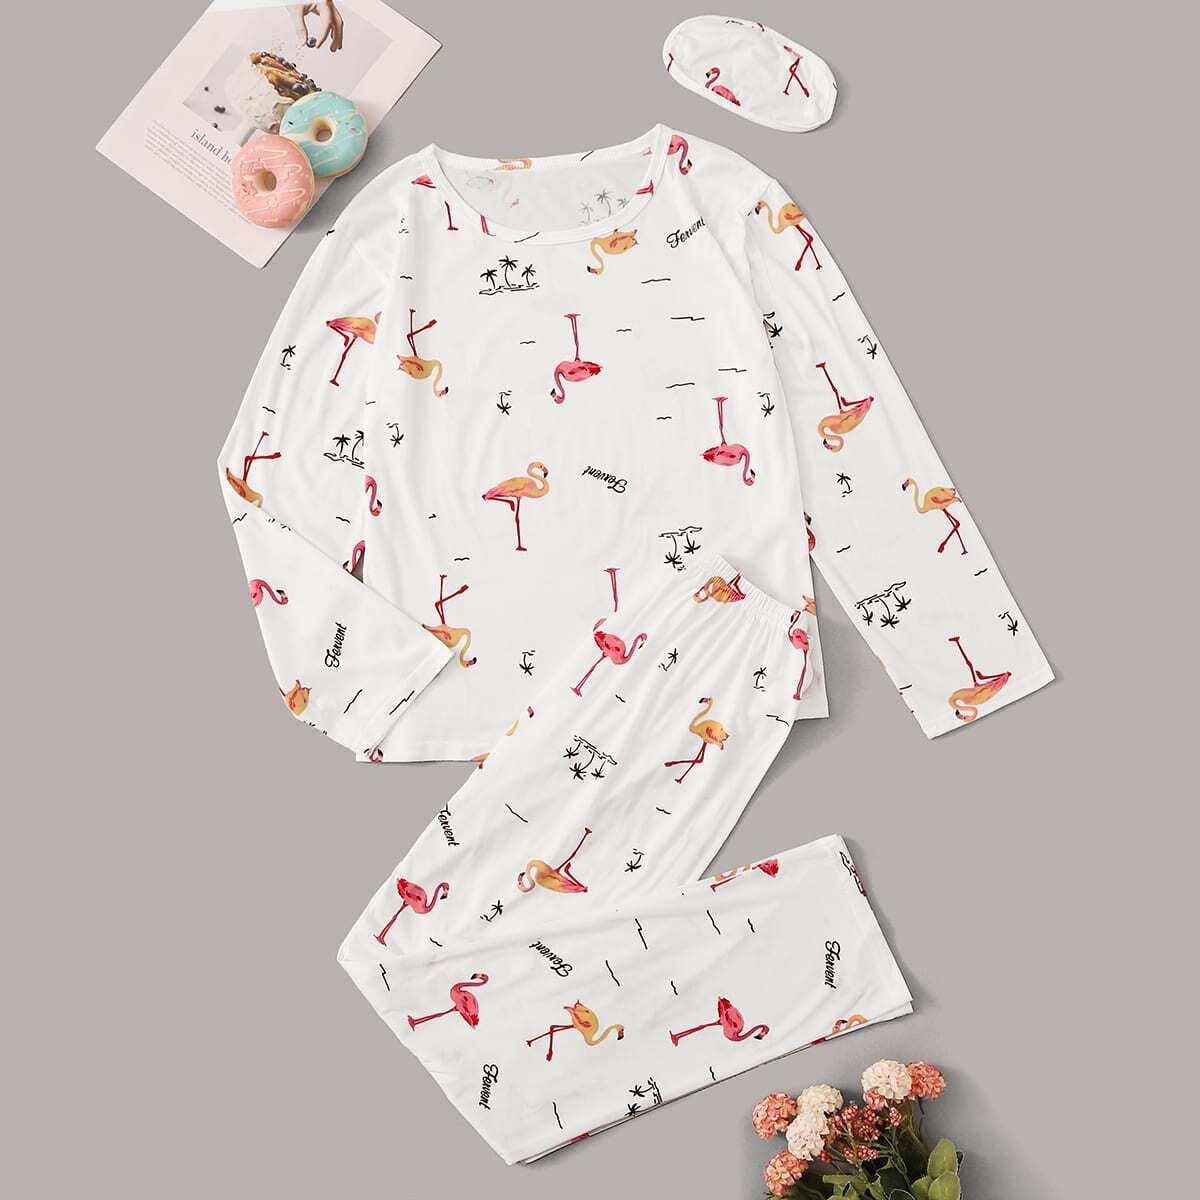 Wit Schattig Spotprent Lounge kleding